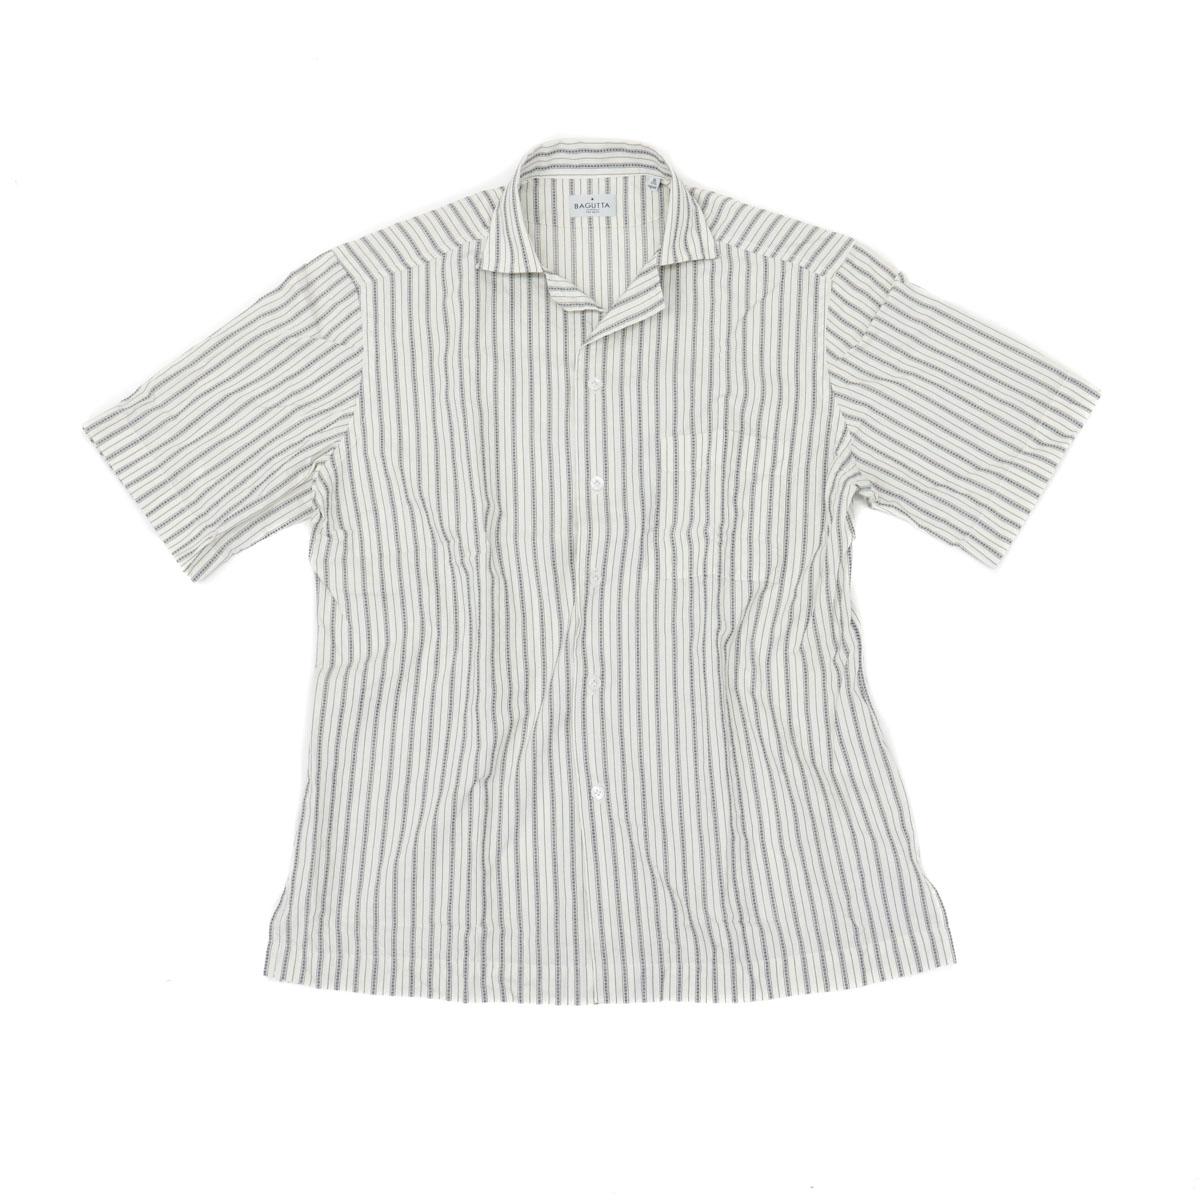 BAGUTTA バグッタオープンカラーシャツ[ストライプ/ホワイト]